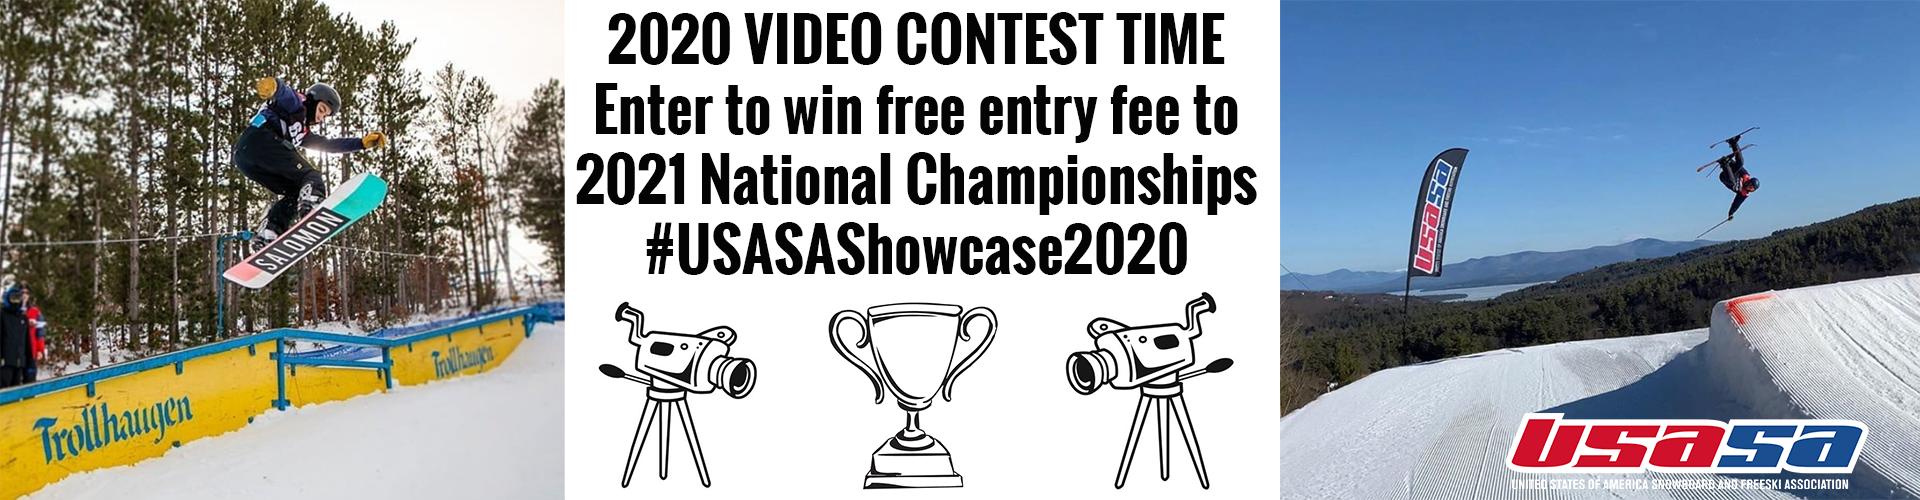 2020-Video-Contest-2